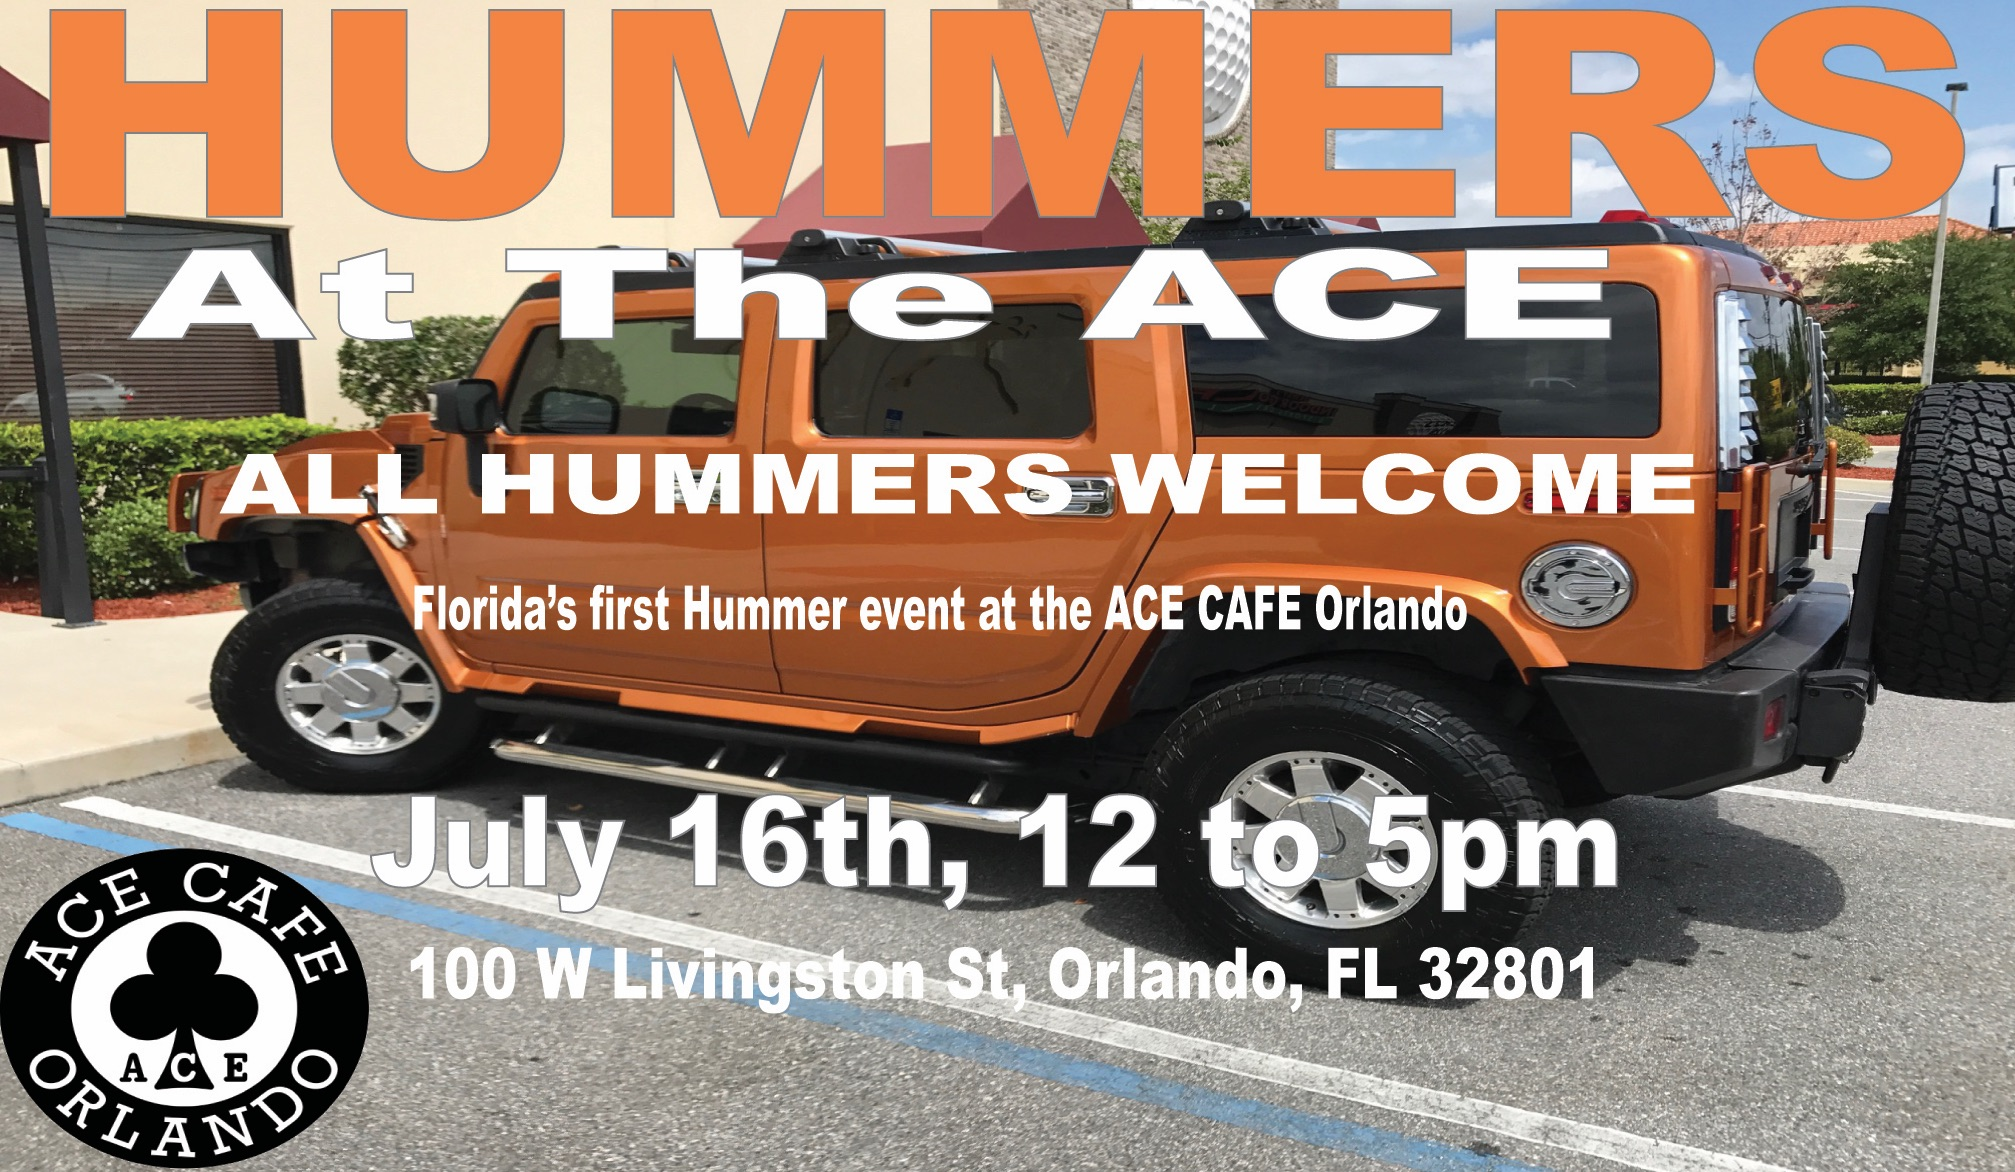 Orlando Hummer Event Hummer Forums Enthusiast Forum for Hummer